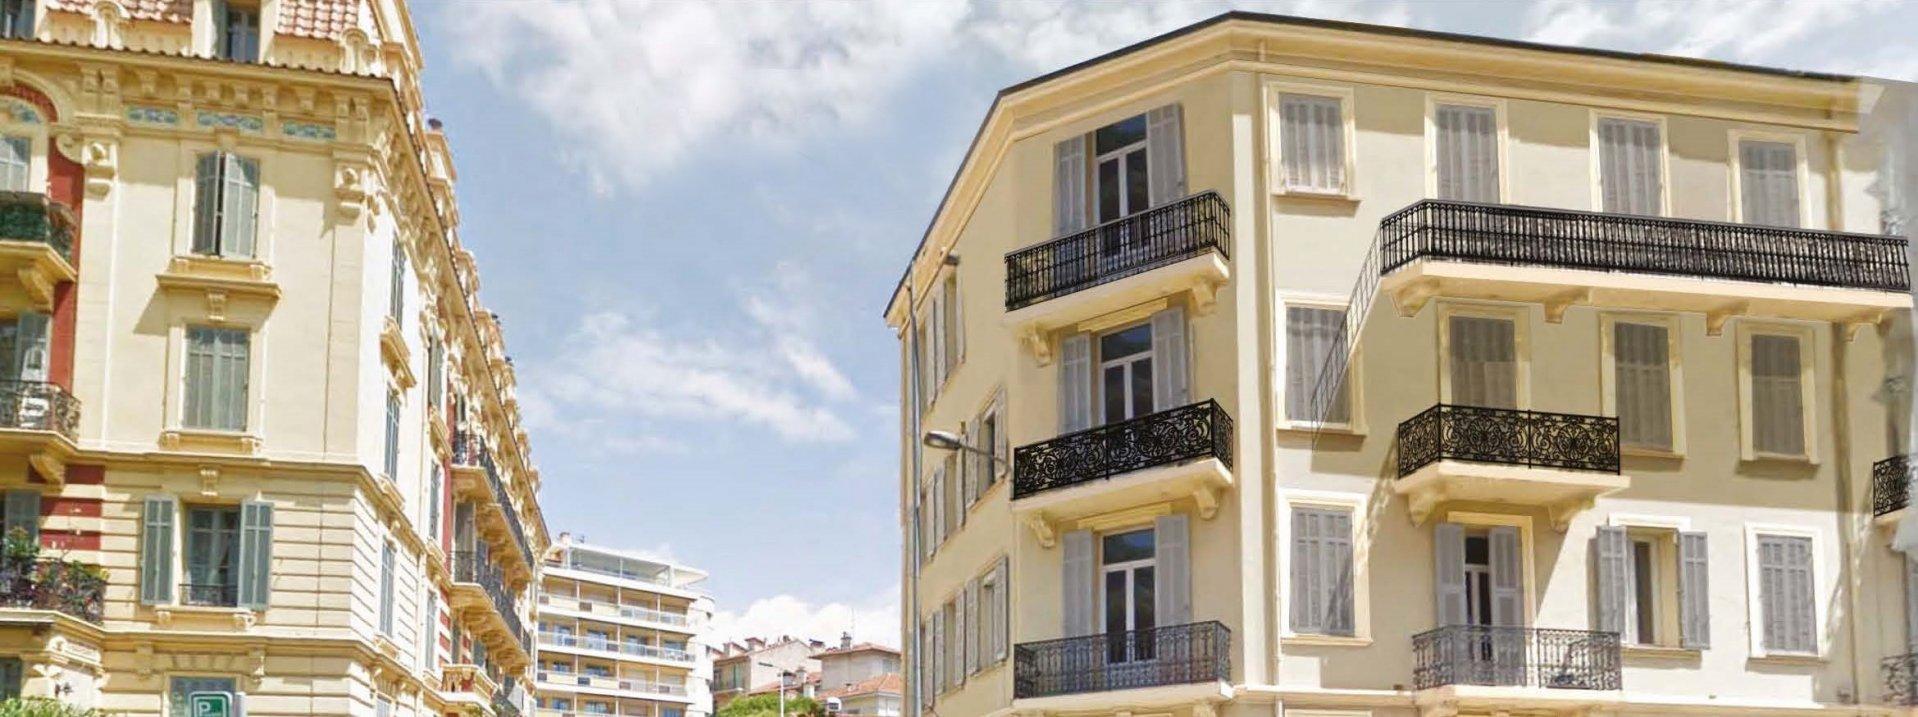 Cannes Centre T3 Investissement